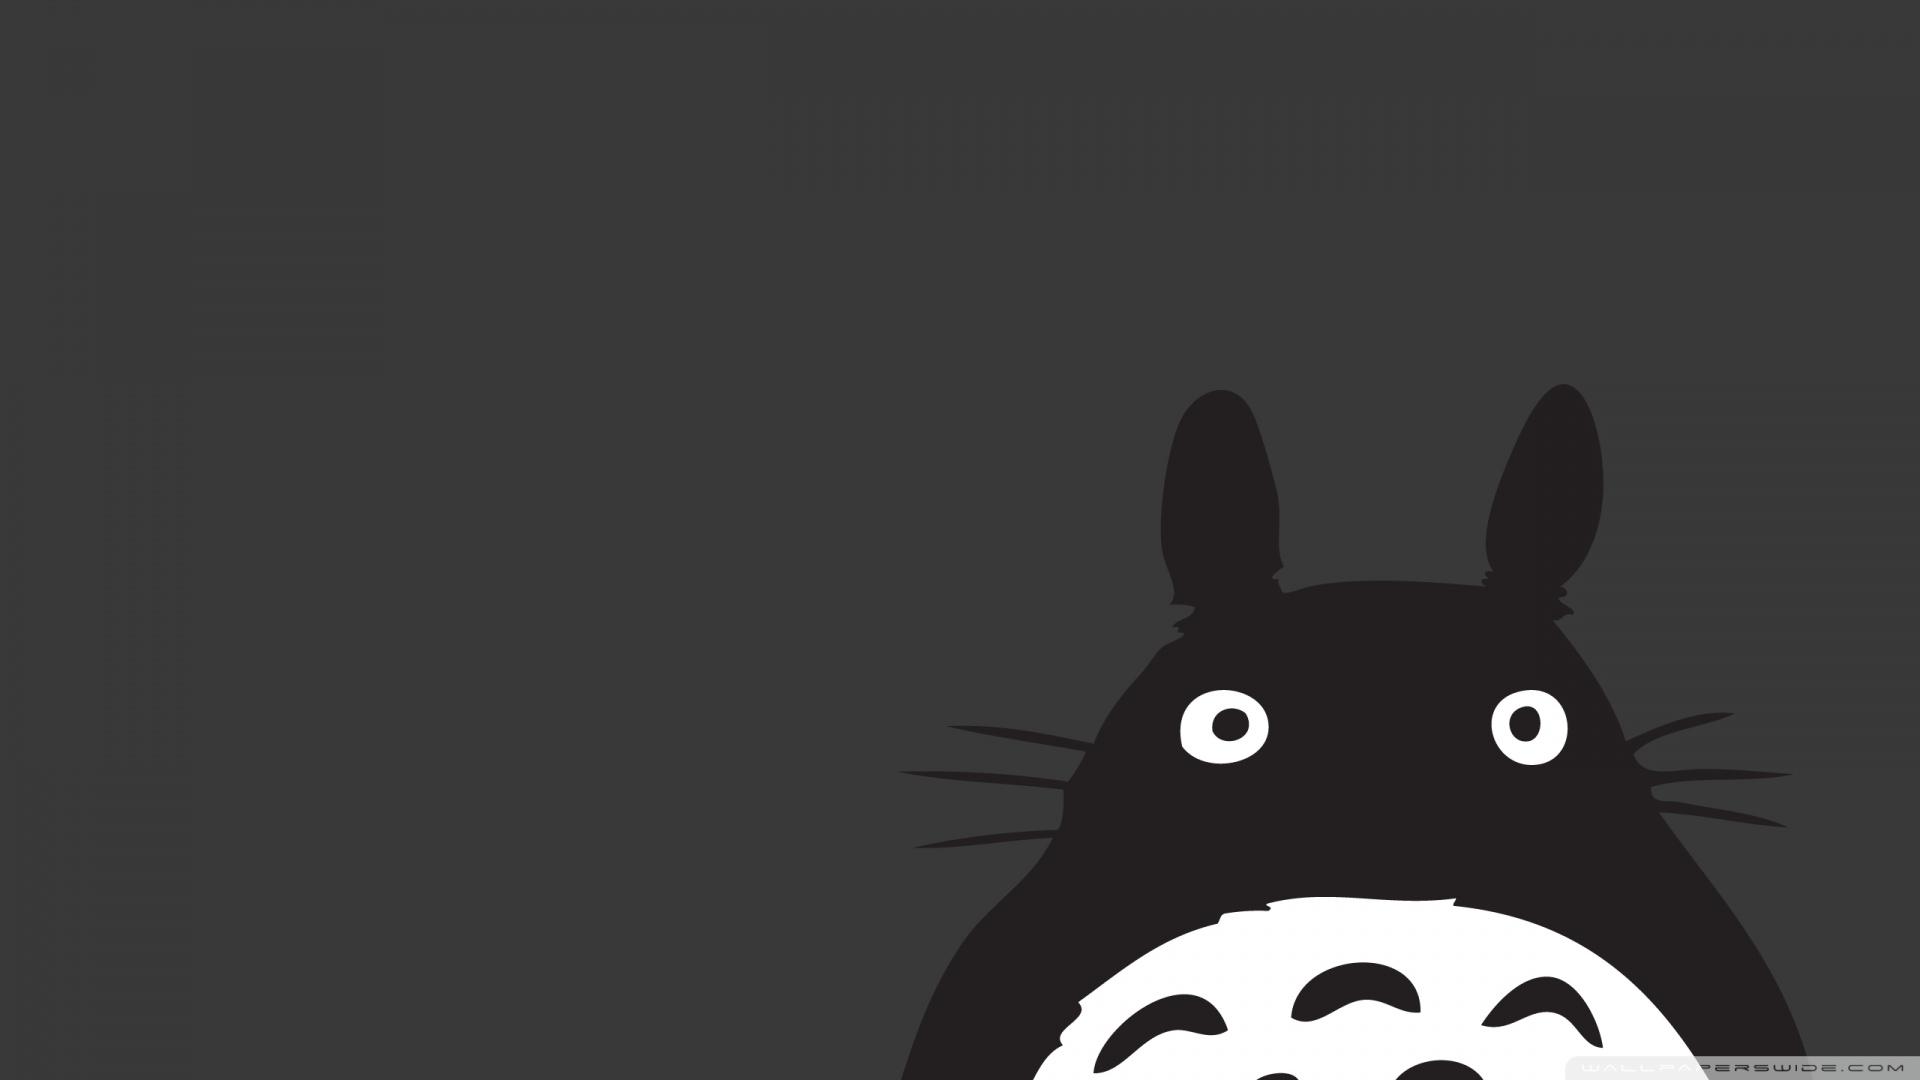 Totoro Anime Wallpaper 1920x1080 Totoro Anime 1920x1080